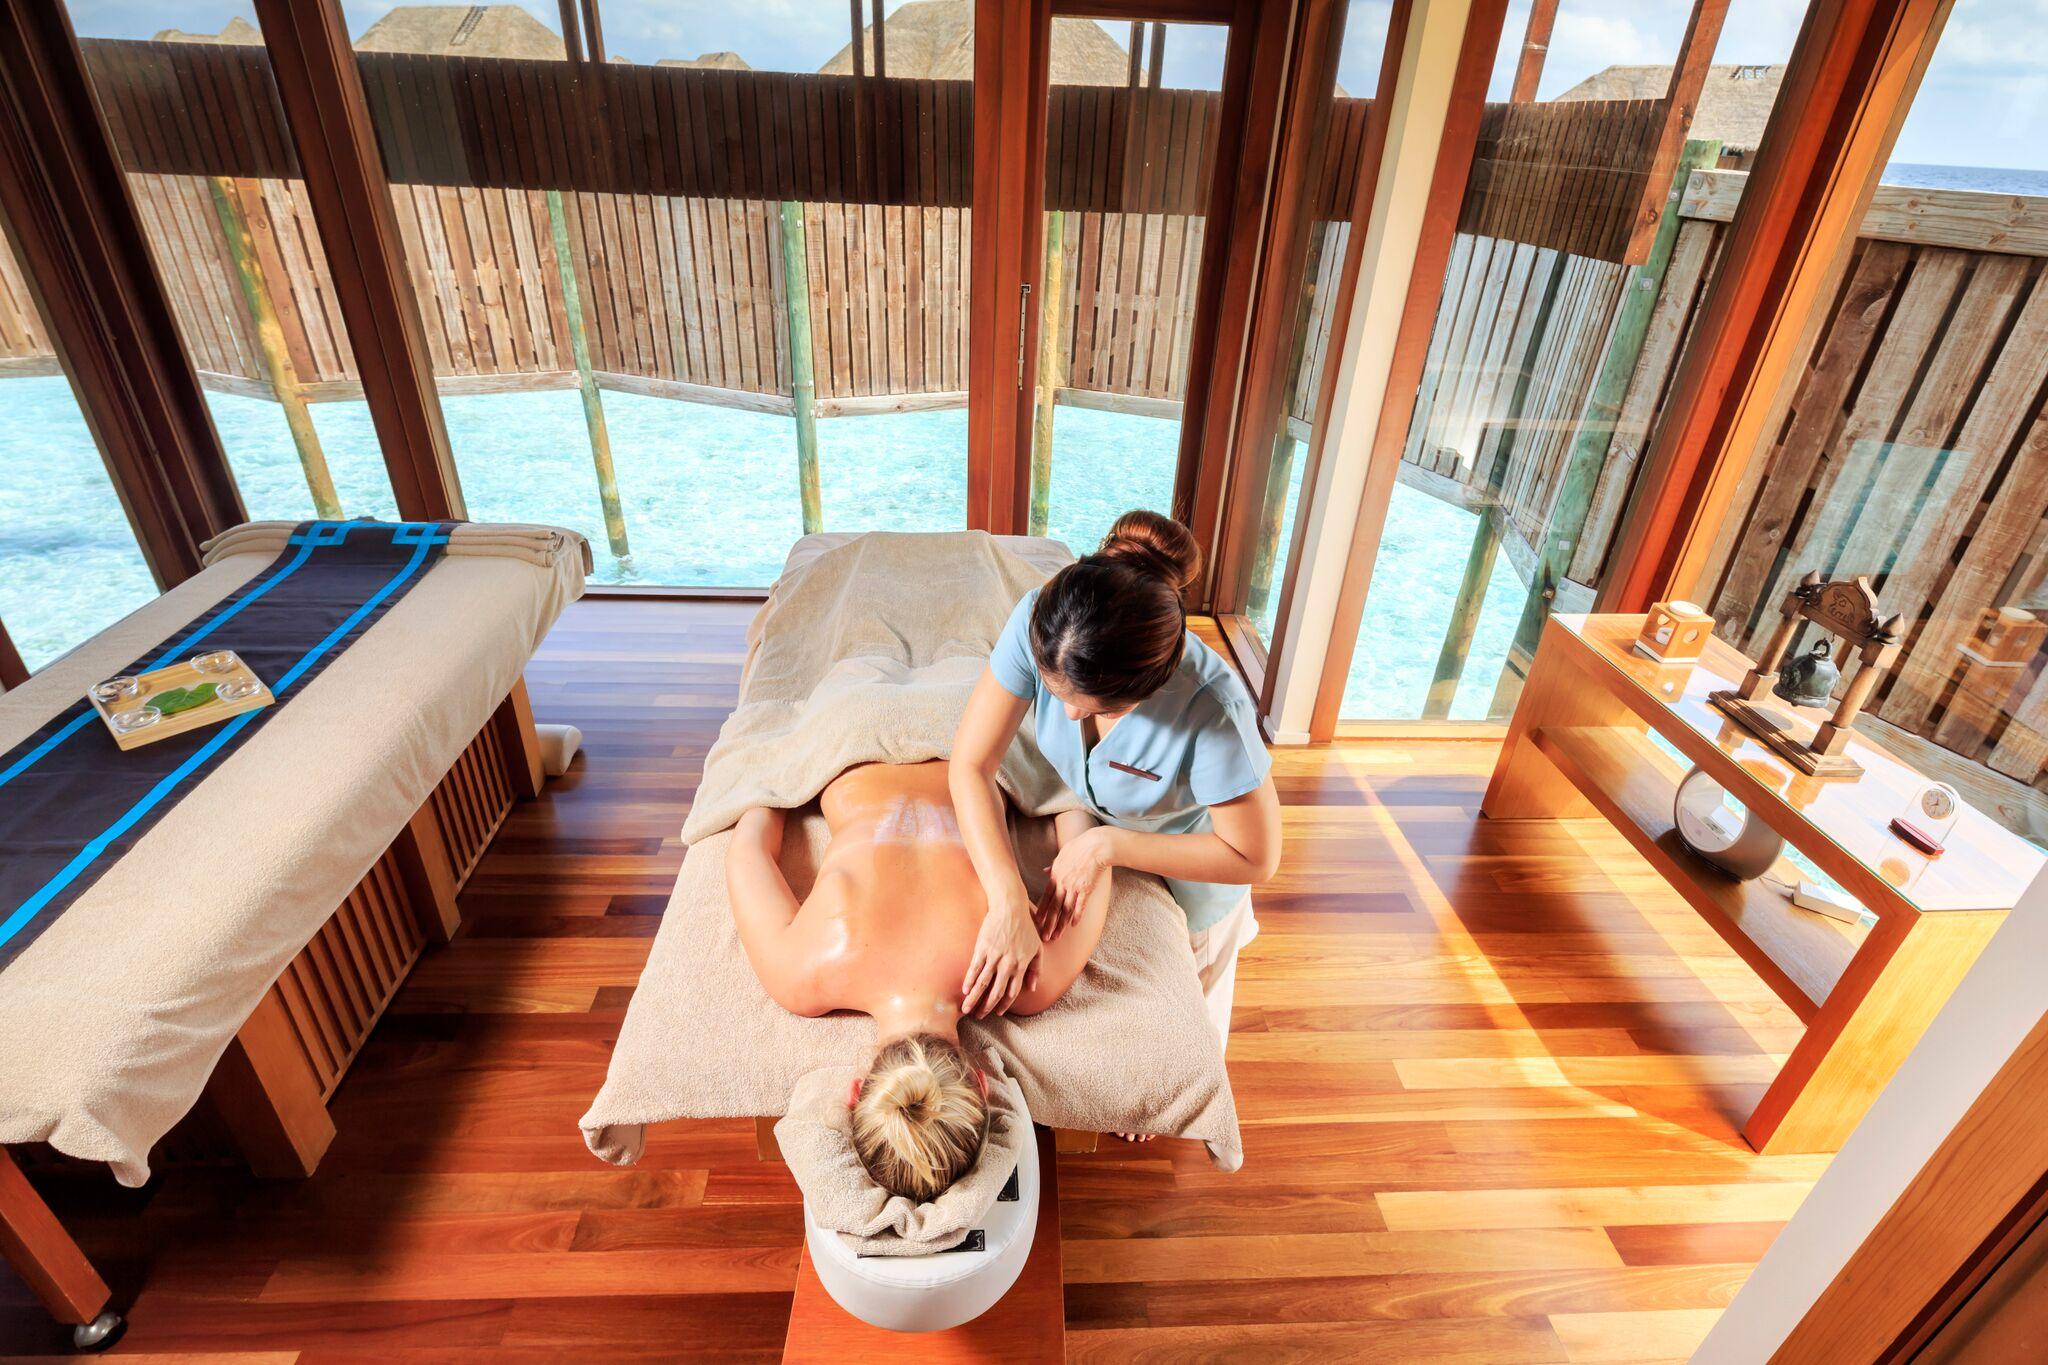 CMRI_The Spa Retreat Treatment_preview.jpeg